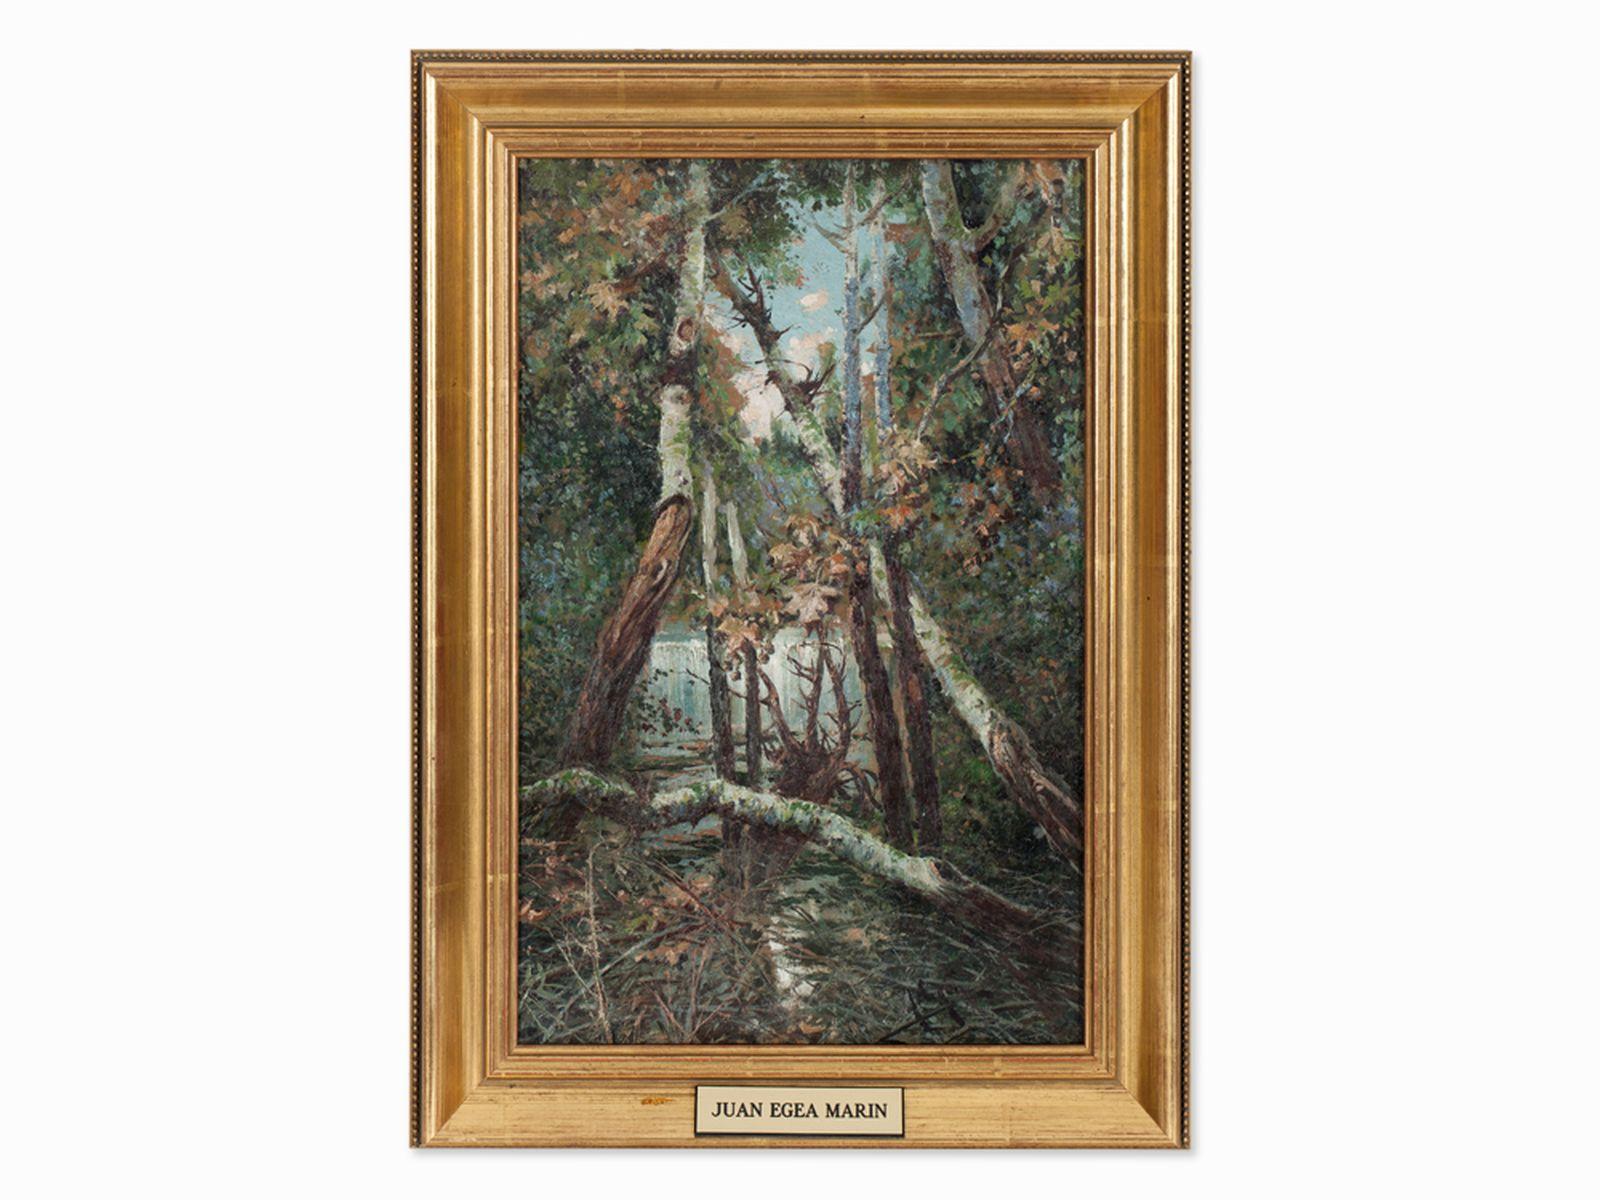 #23 Juan Egea Y Marin, Oil Painting, Waterfall with Birches, c.1890 |Juan Egea Y Marin, Ölgemälde, Wasserfall mit Birken, um 1890 Image